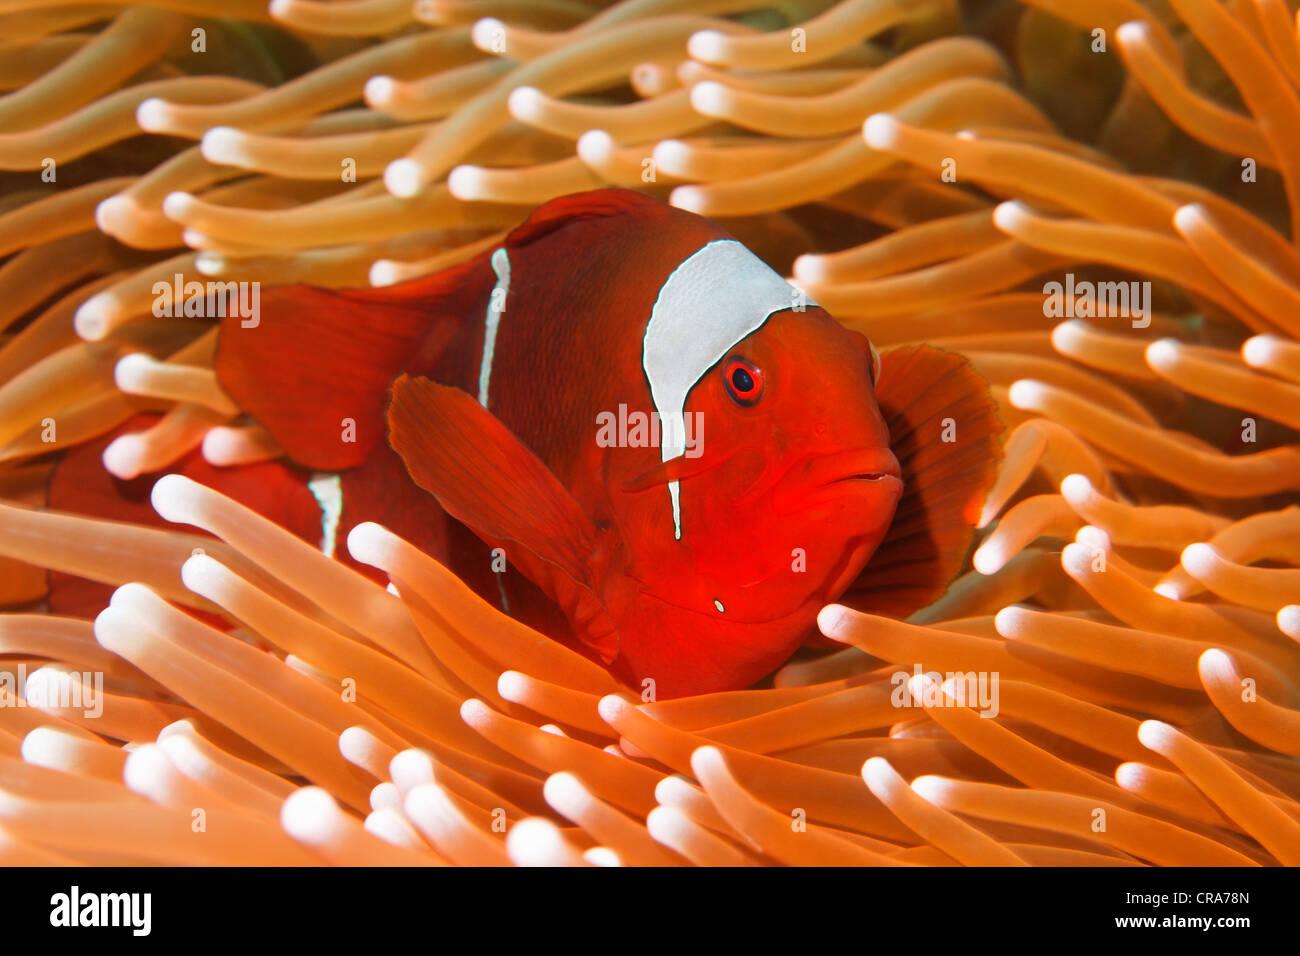 Maroon Clownfish Stock Photos & Maroon Clownfish Stock Images - Alamy